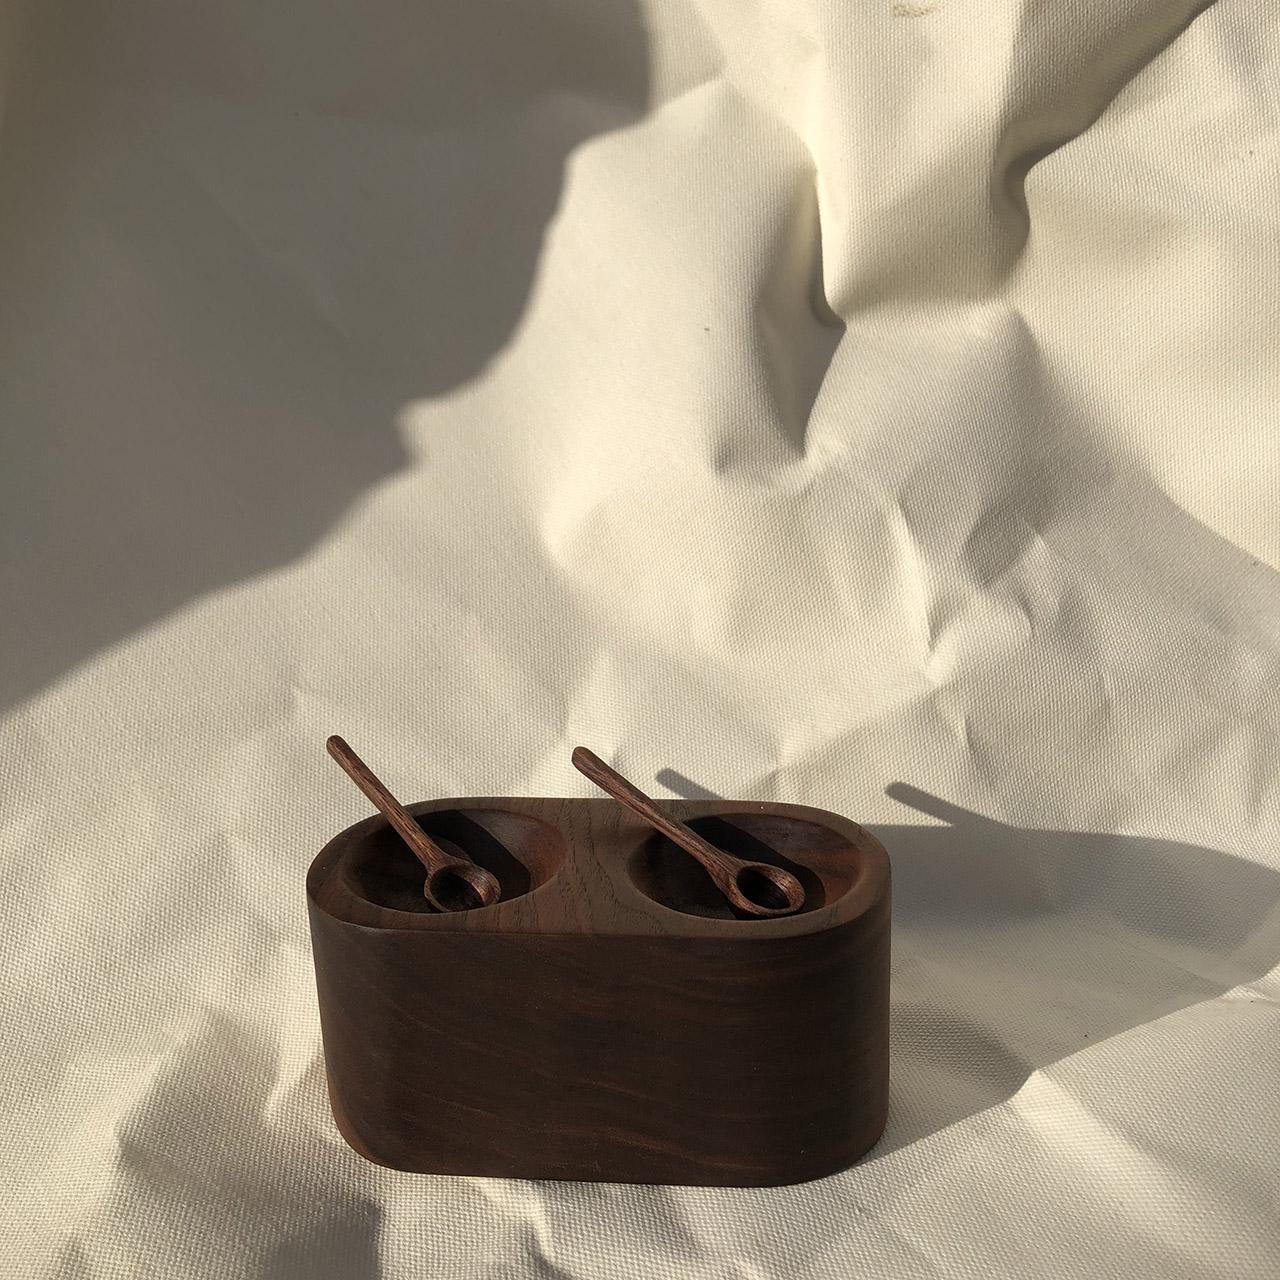 Salt & Pepper Cellar from Unlikely Objects